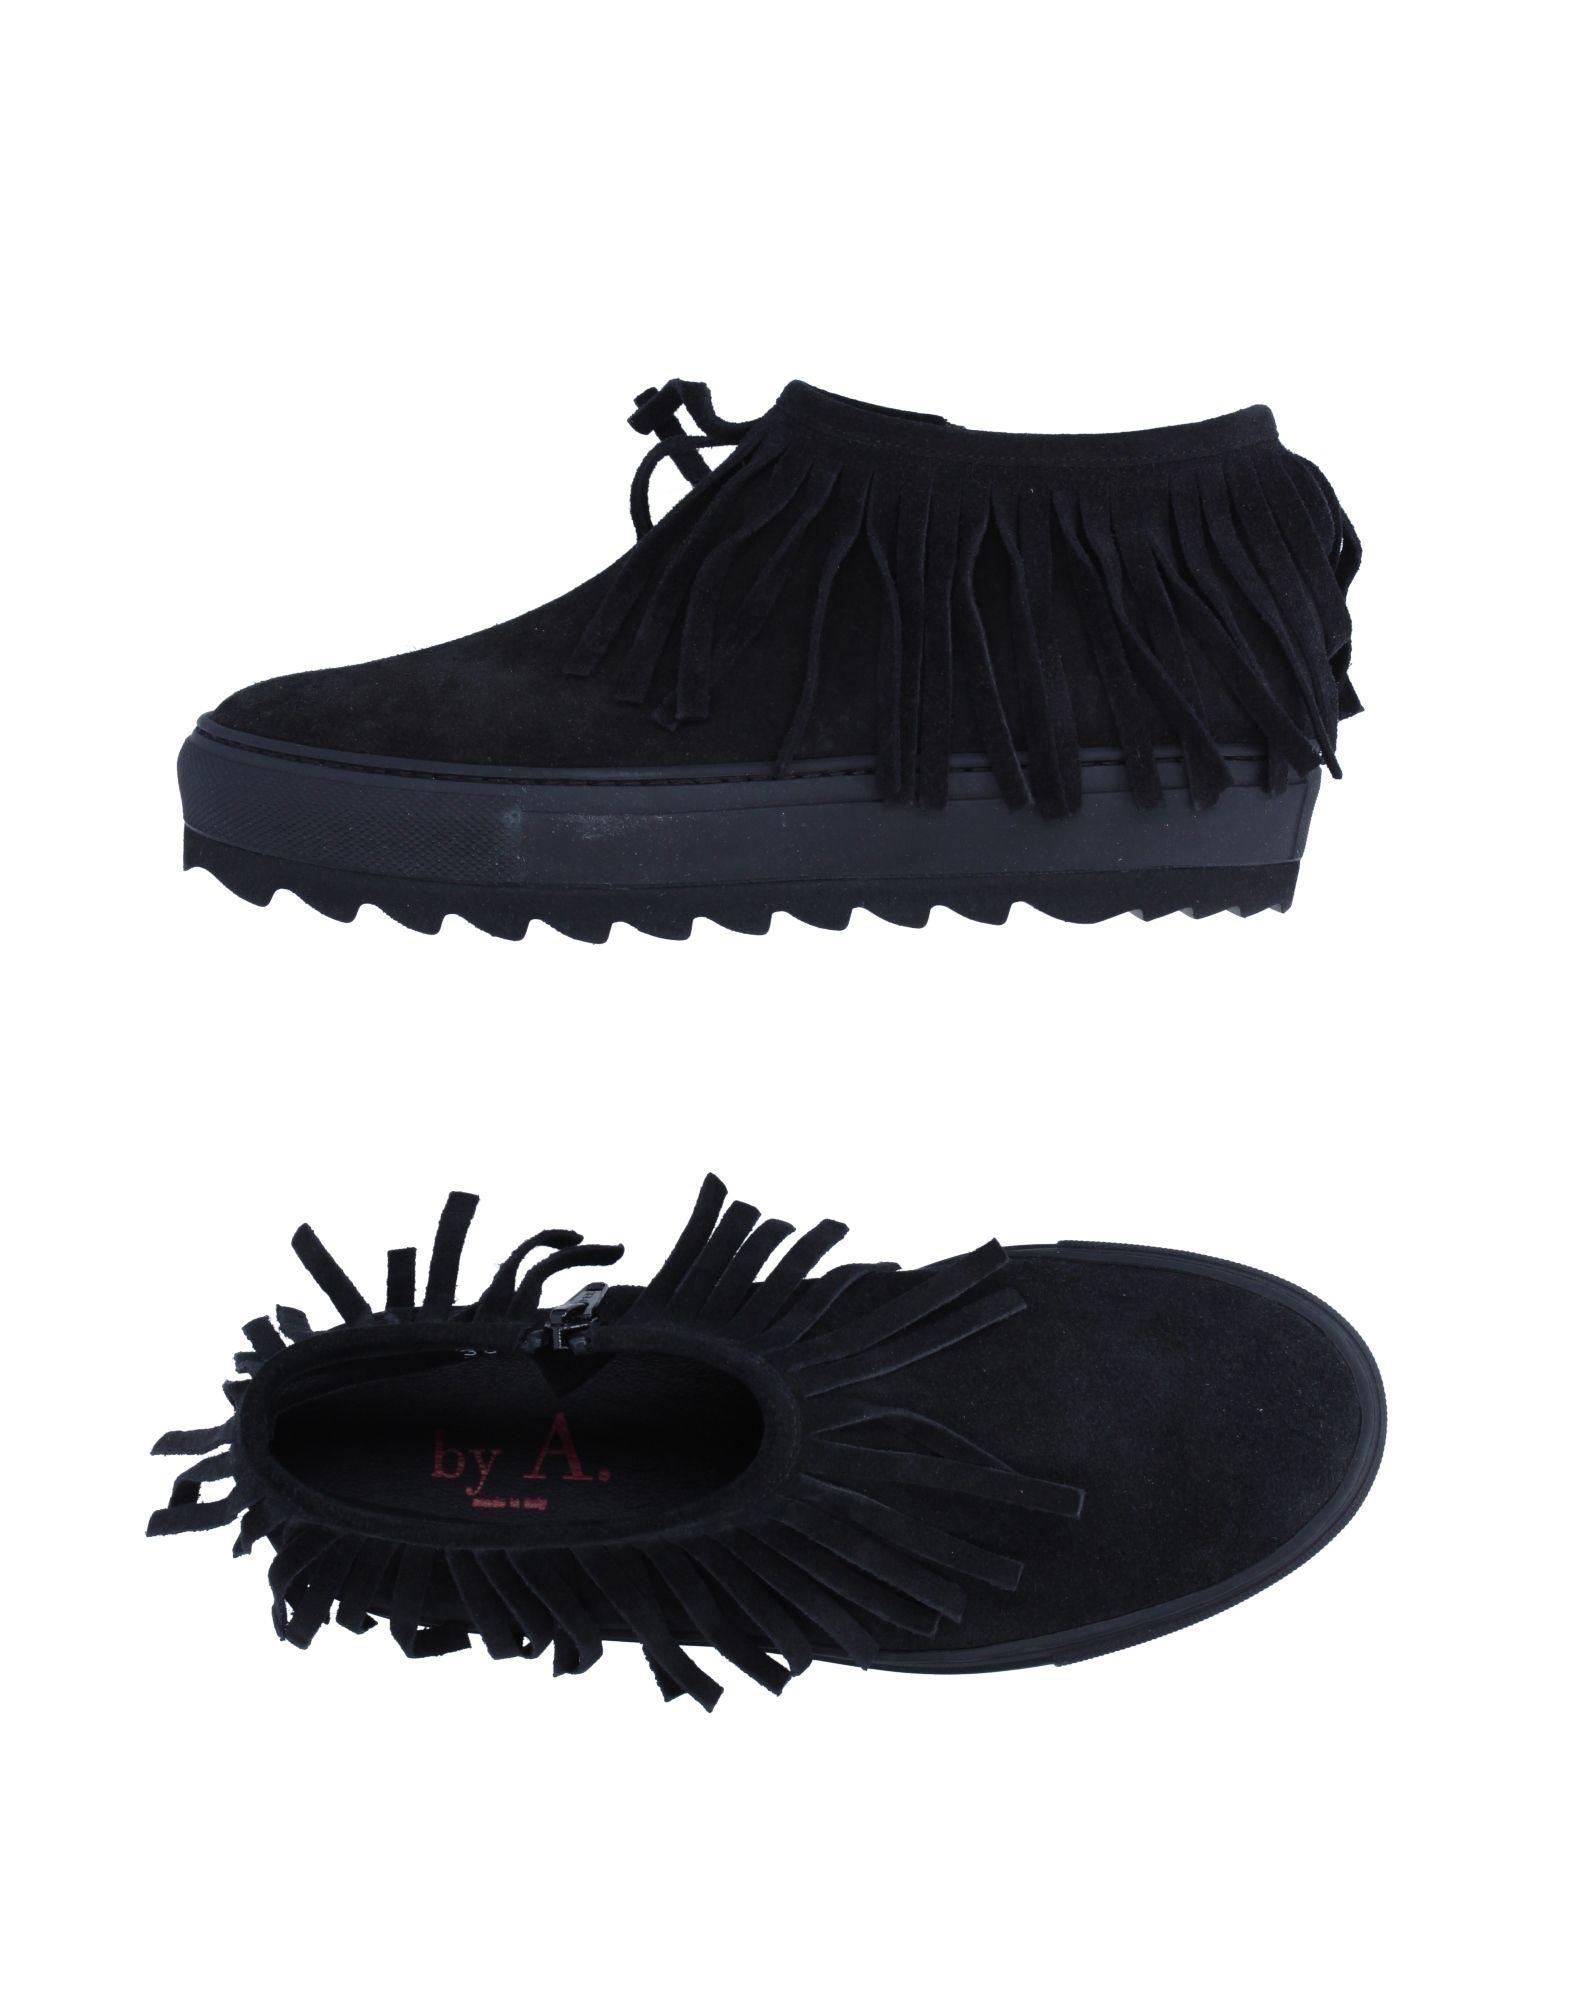 By A. Sneakers Sneakers Sneakers Damen  11252714CH 548d1a